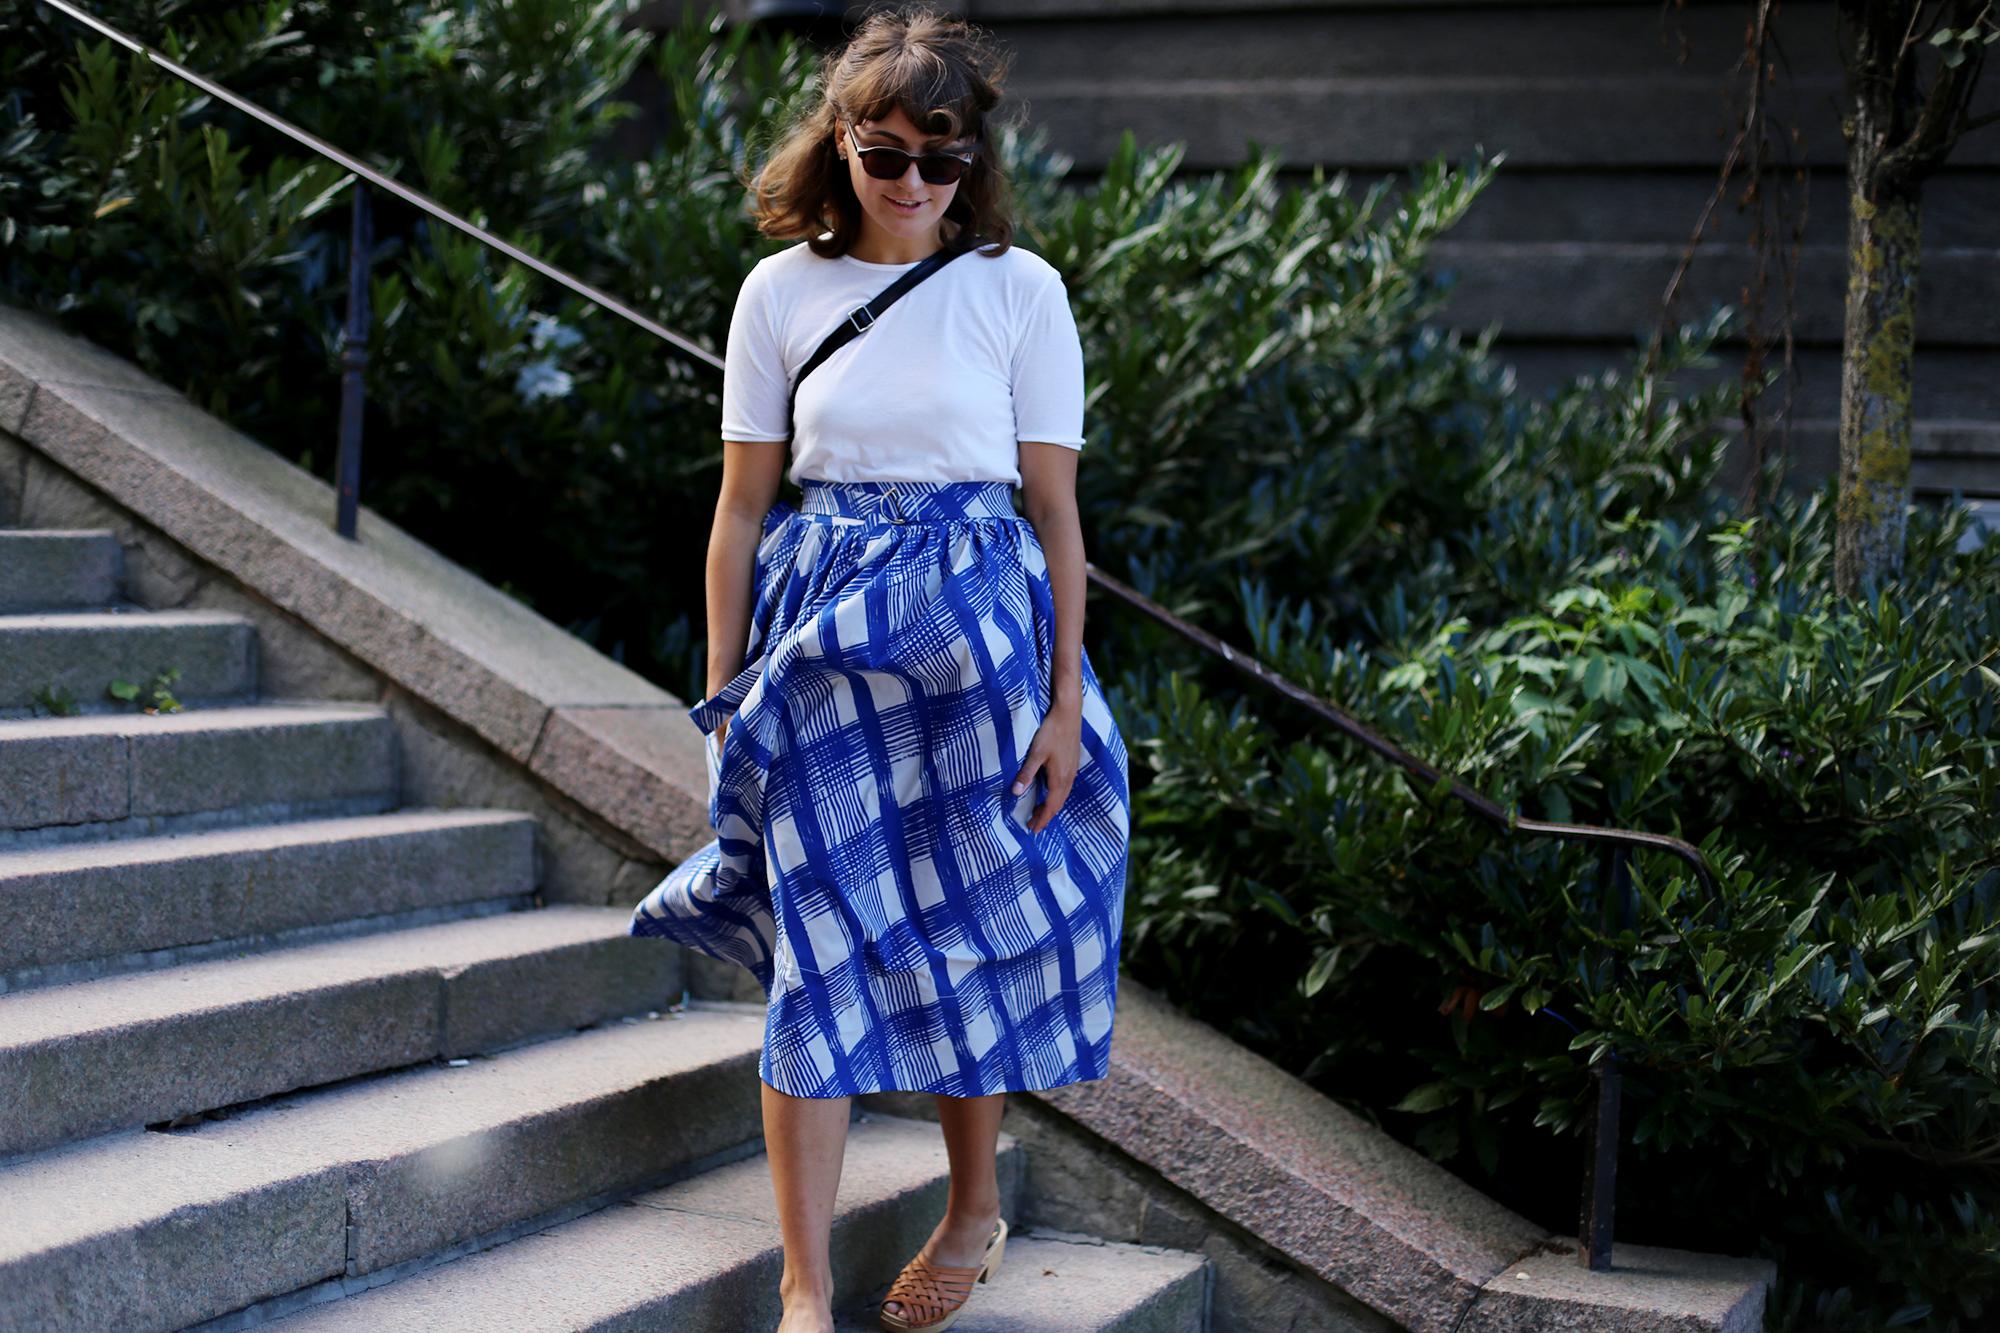 vad jag bar i lördags: Sara Edström Metro Mode